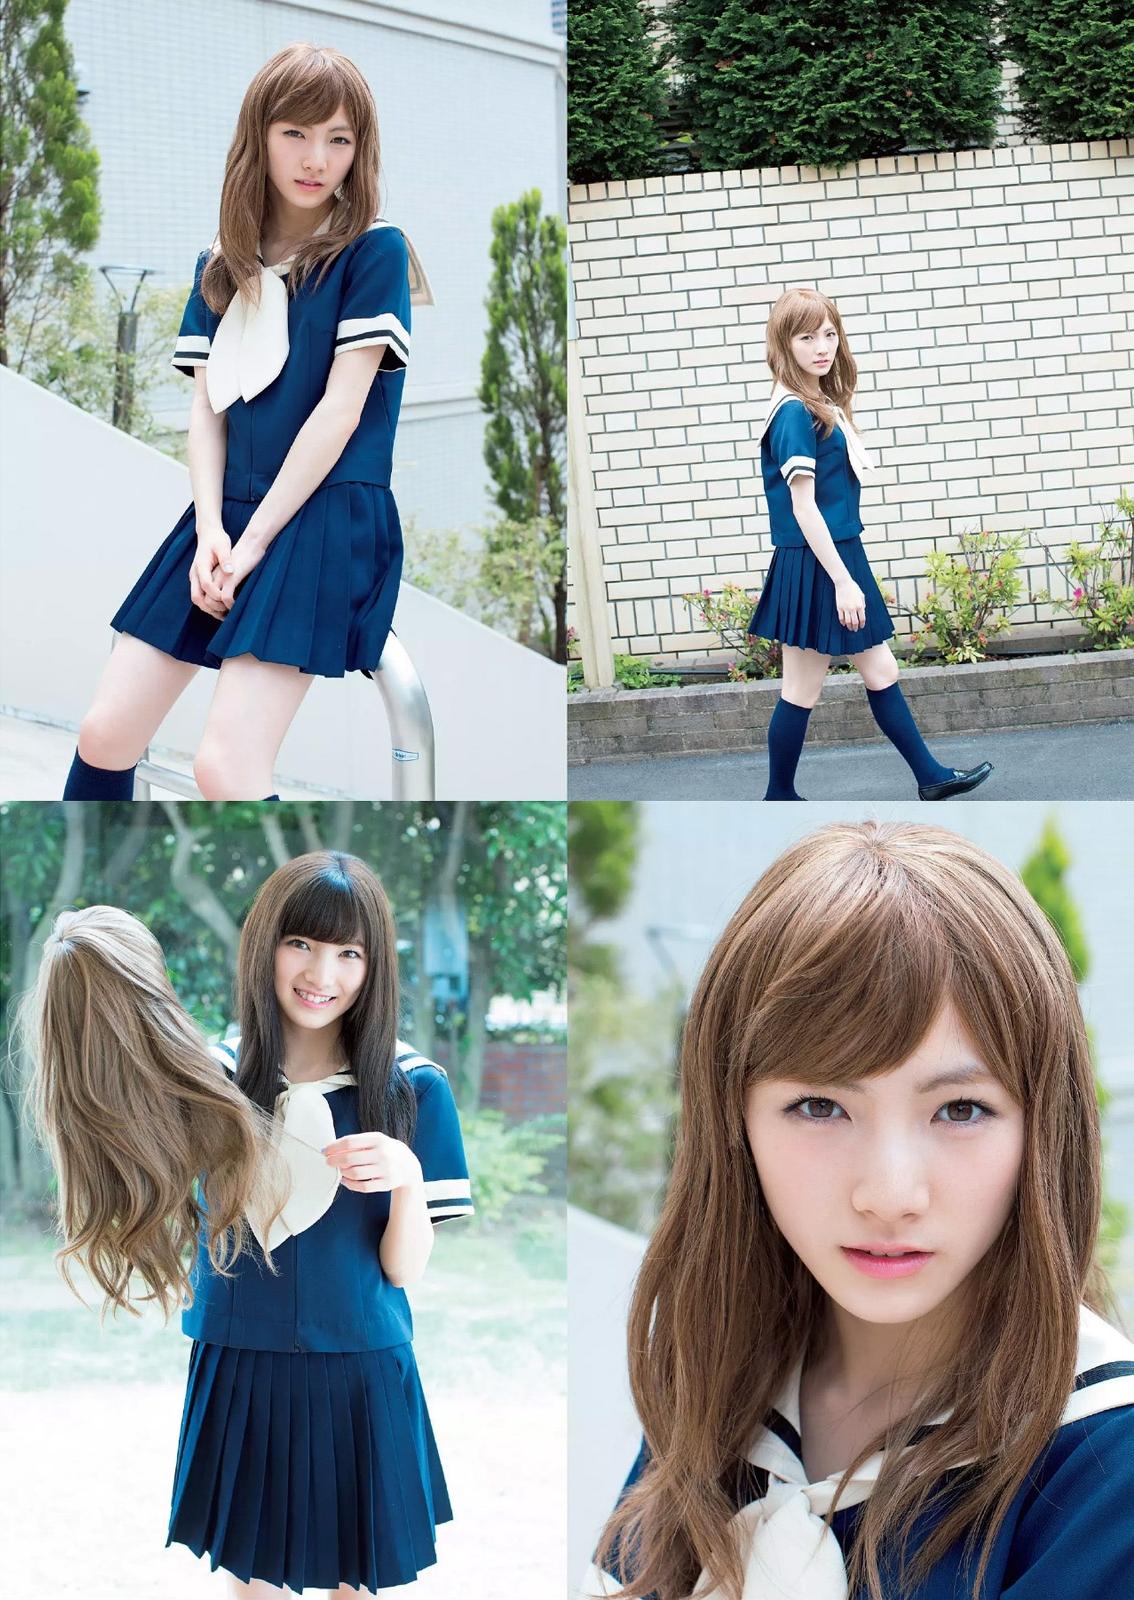 ... AKB48 - Photos Videos News: AKB48 Nana Okada